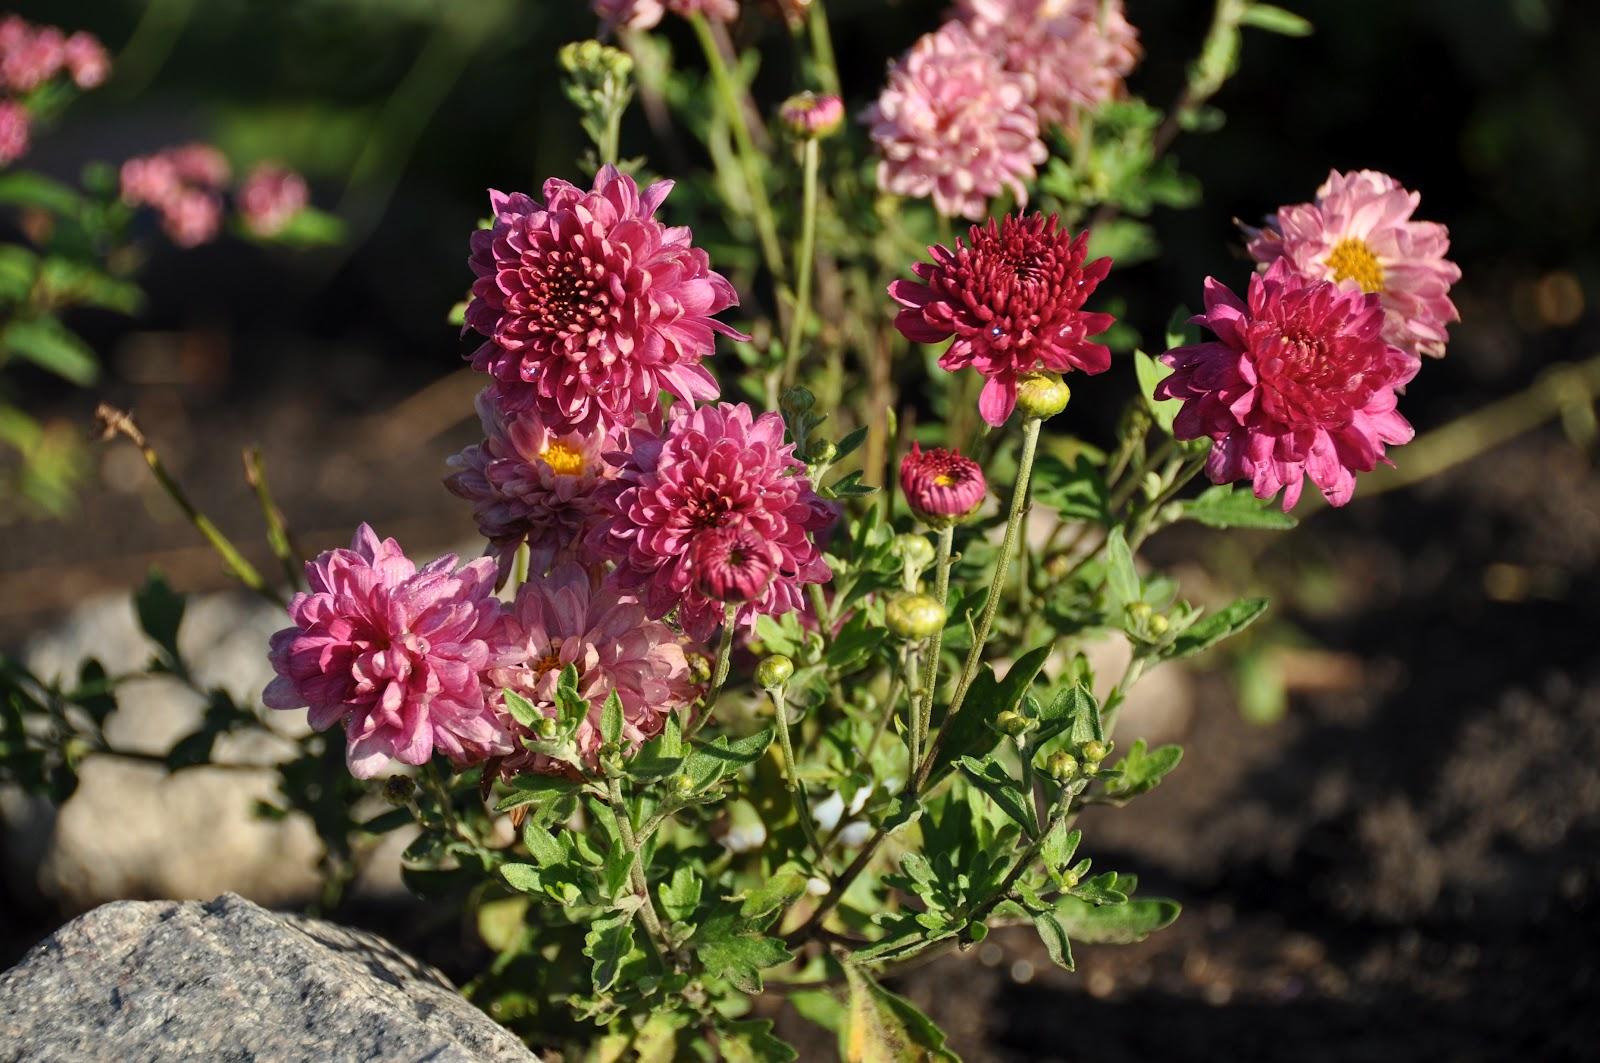 Northern exposure gardening plant list hardy perennials for the northern exposure gardening plant list hardy perennials for the north mightylinksfo